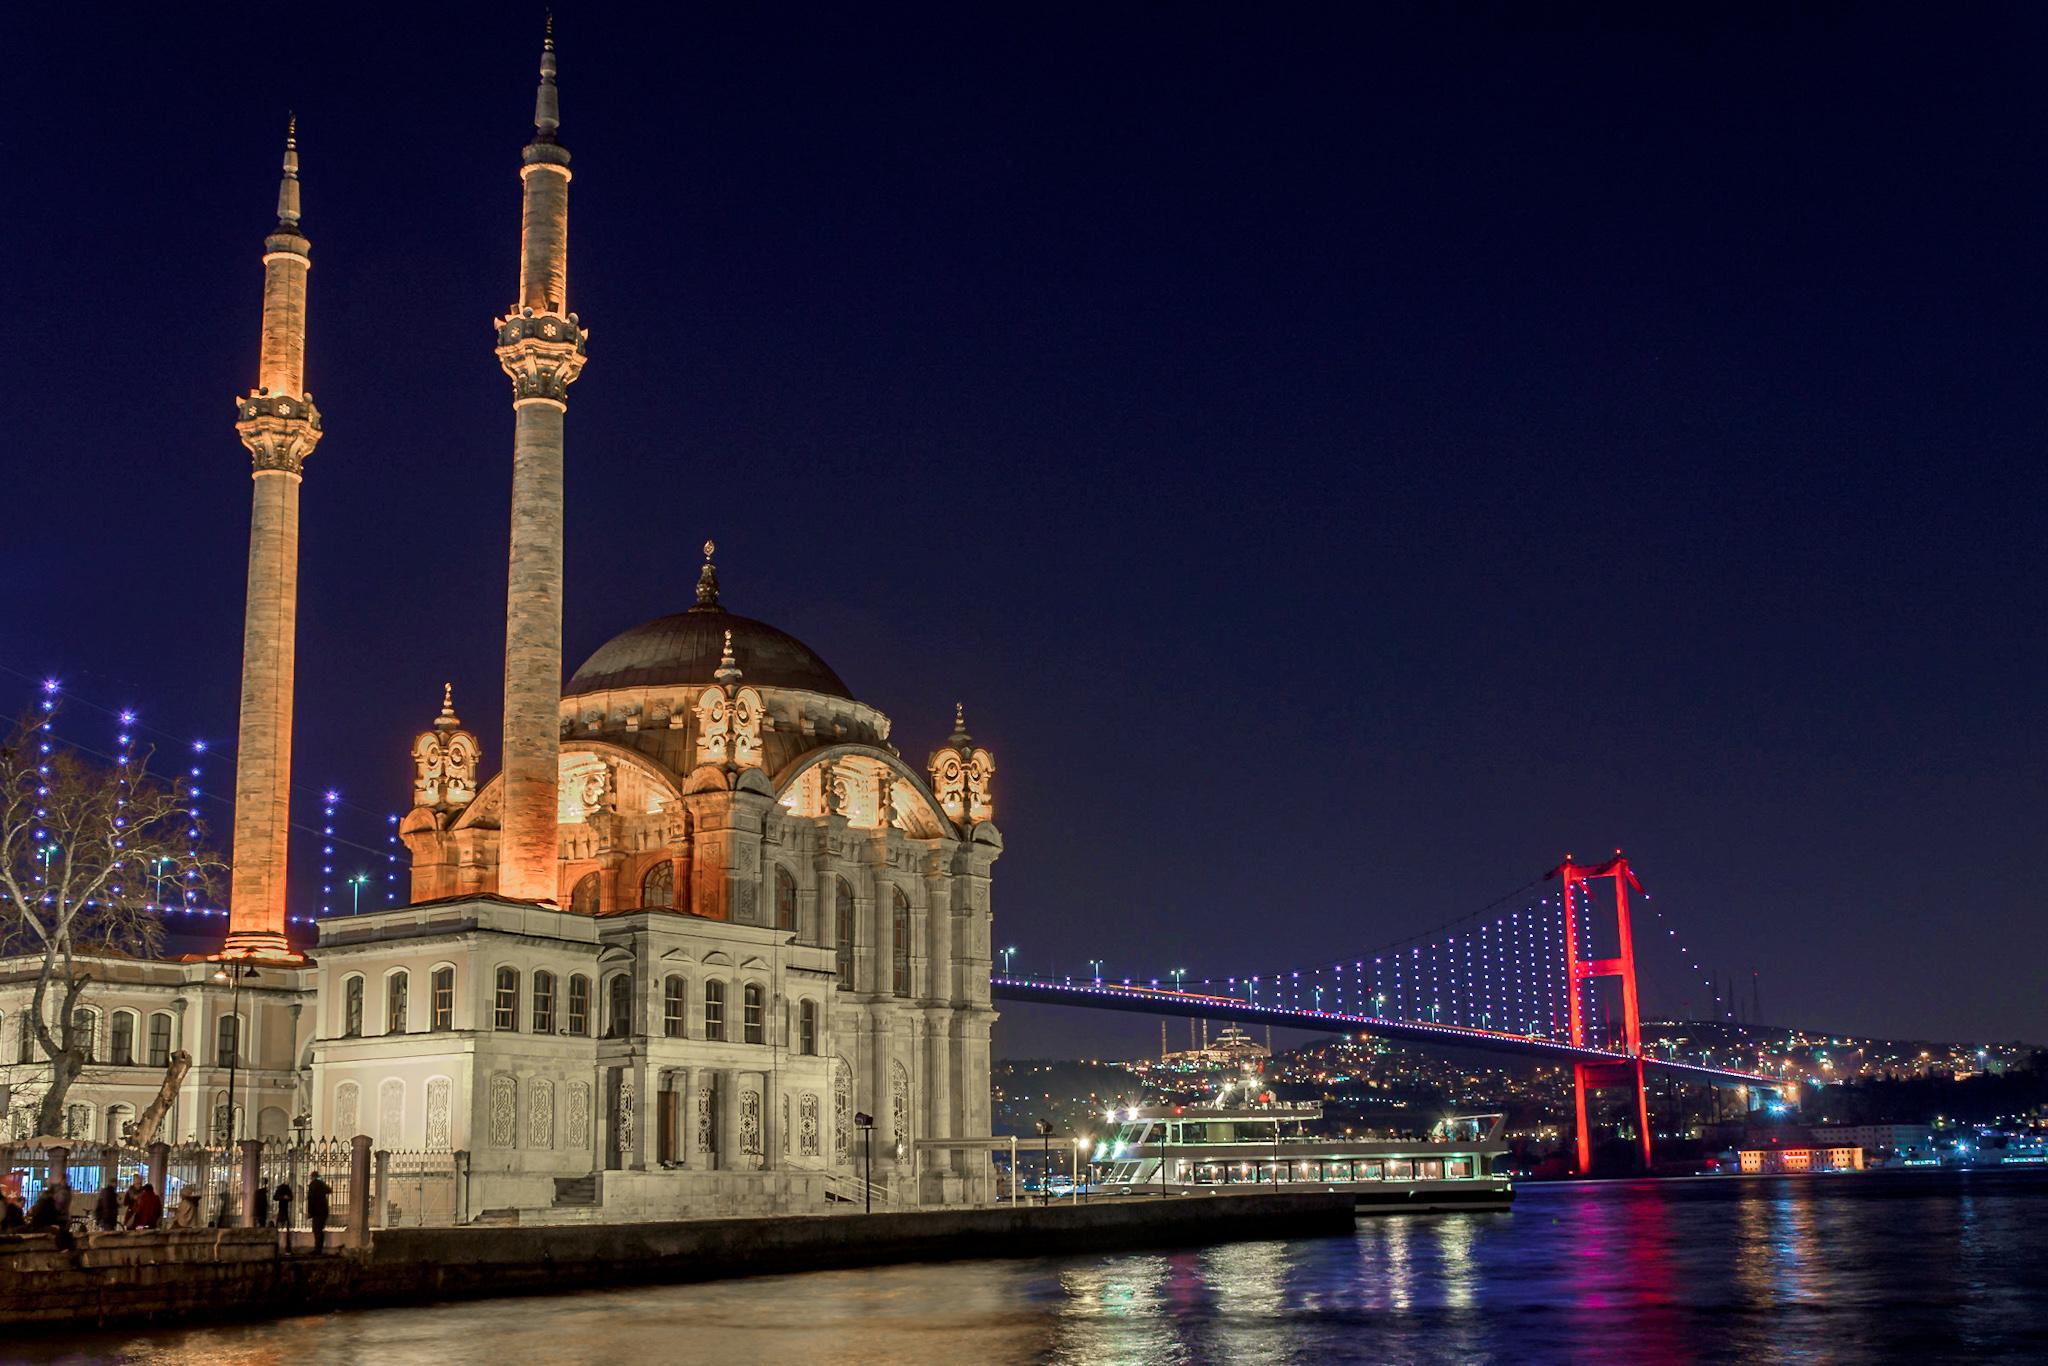 Ortaköy Mosque and Bridge, Turkey